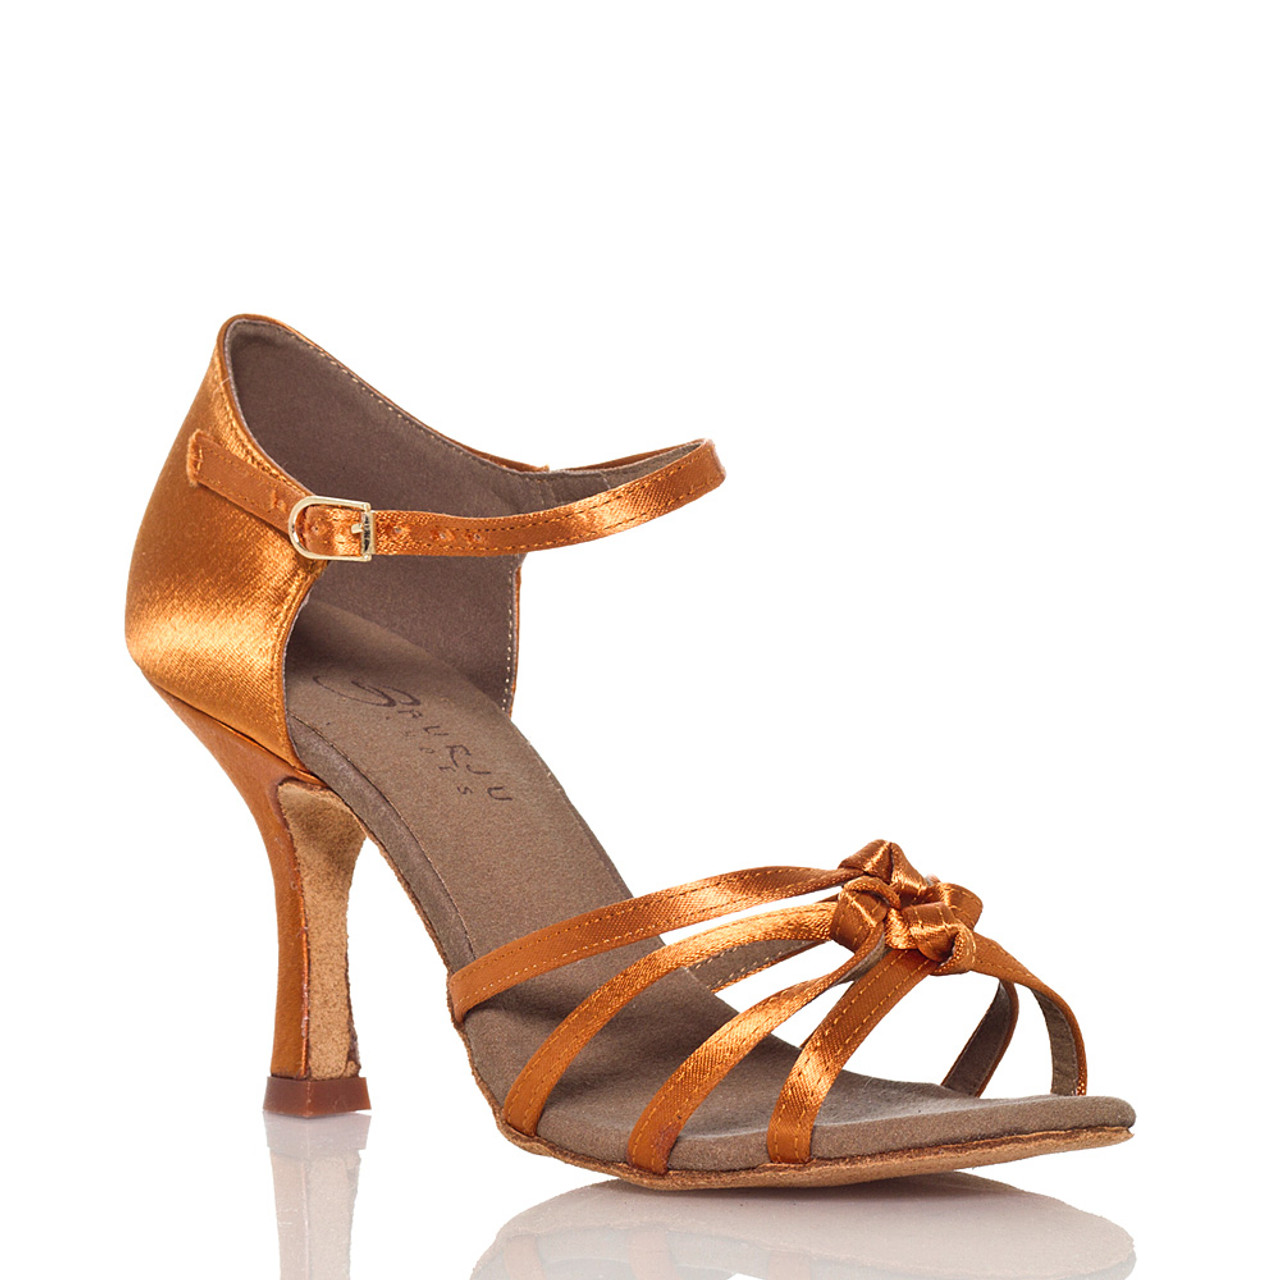 905fb9389da Leyla - Nude Strappy Knot Dance Shoe - 3.5 inch Flared Heels